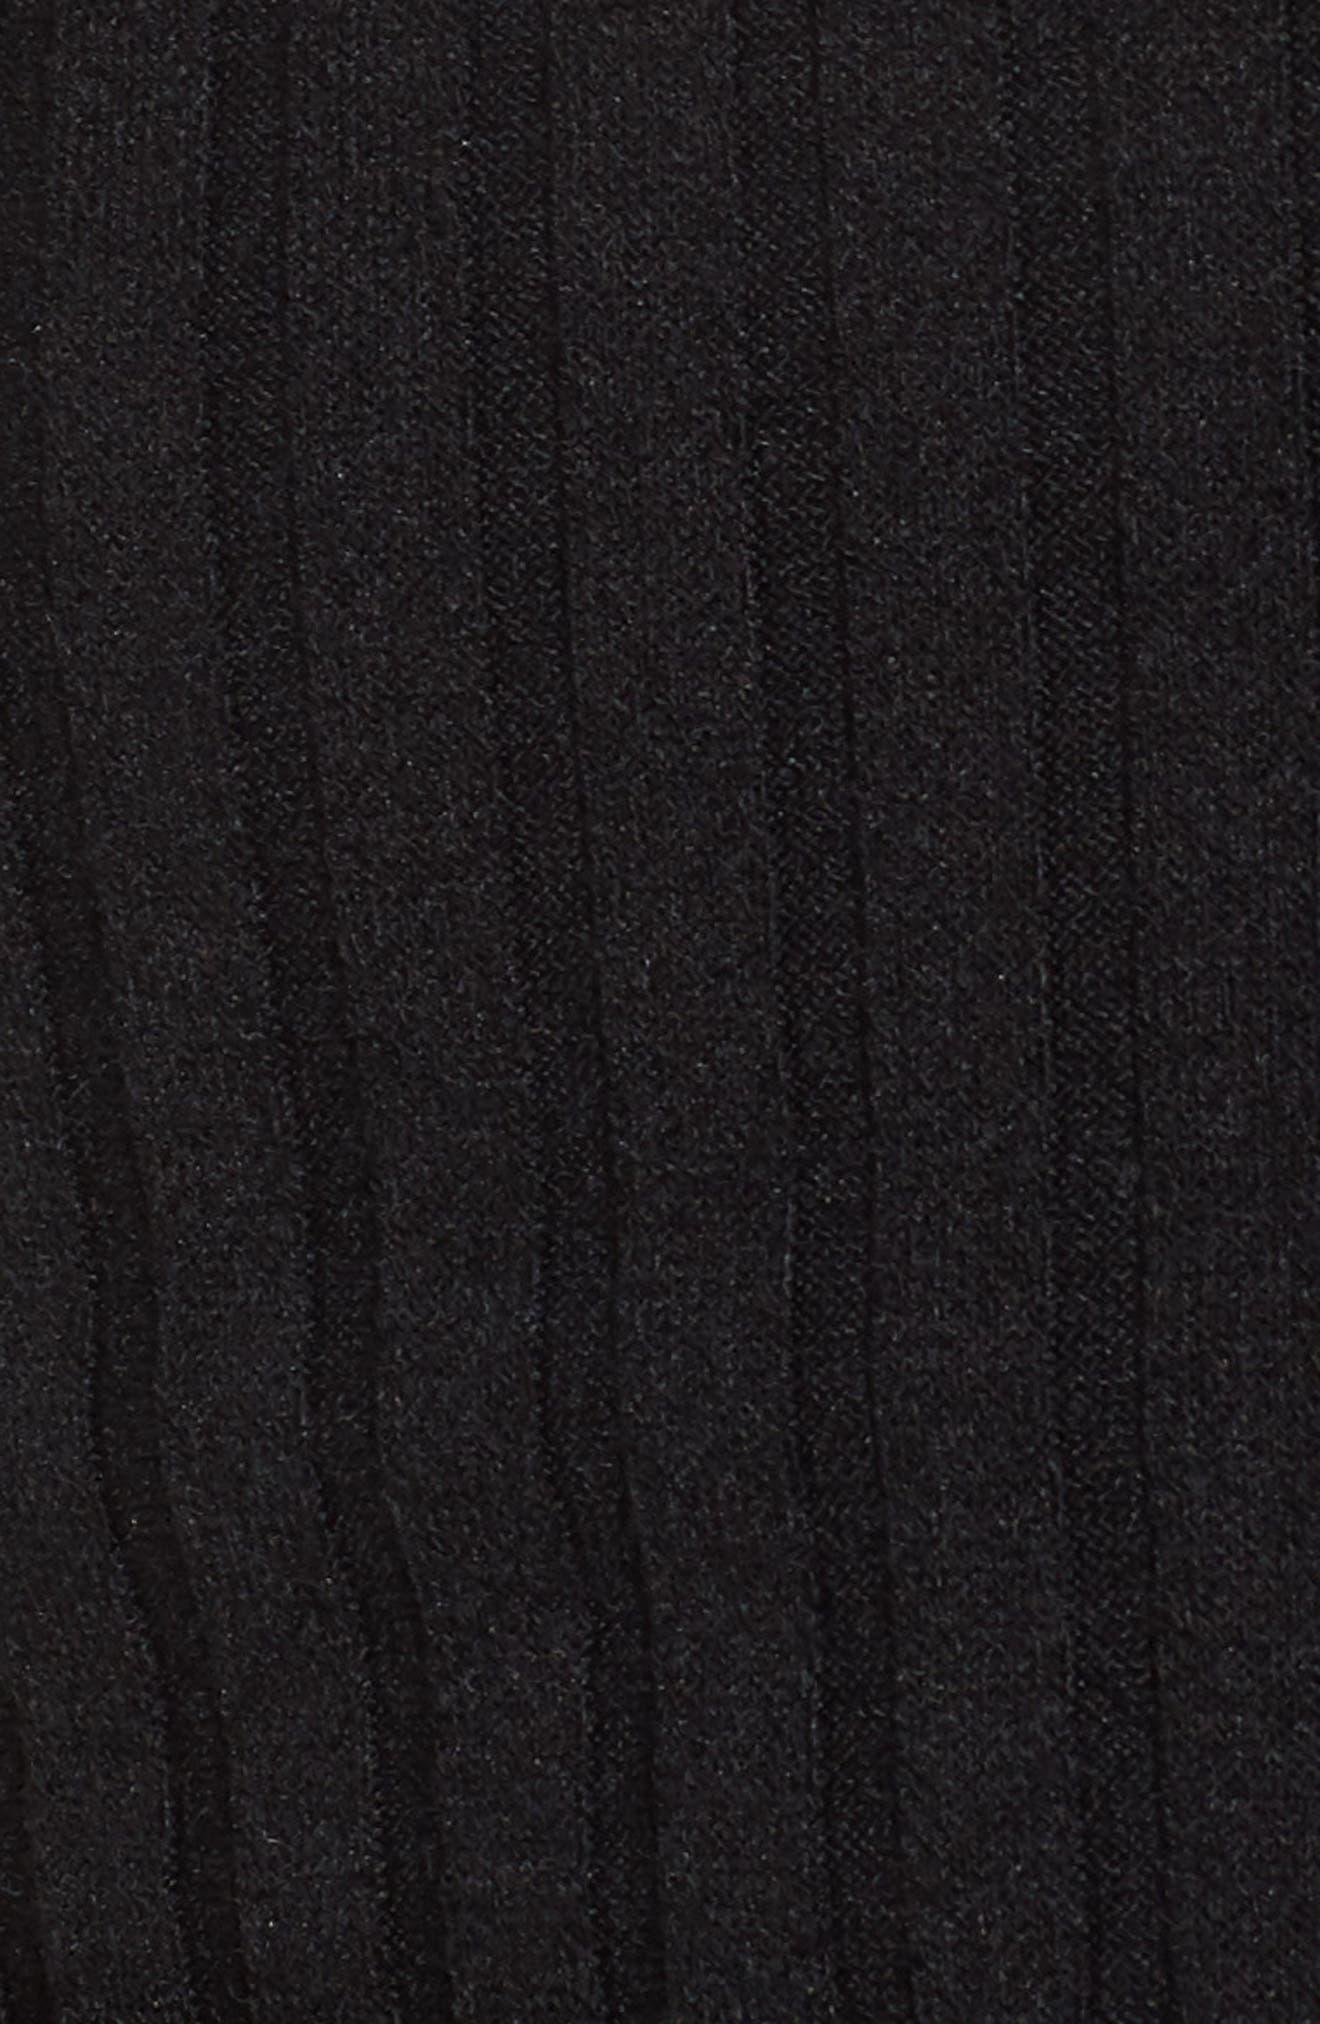 Ruffle Tie Hem Top,                             Alternate thumbnail 6, color,                             Black